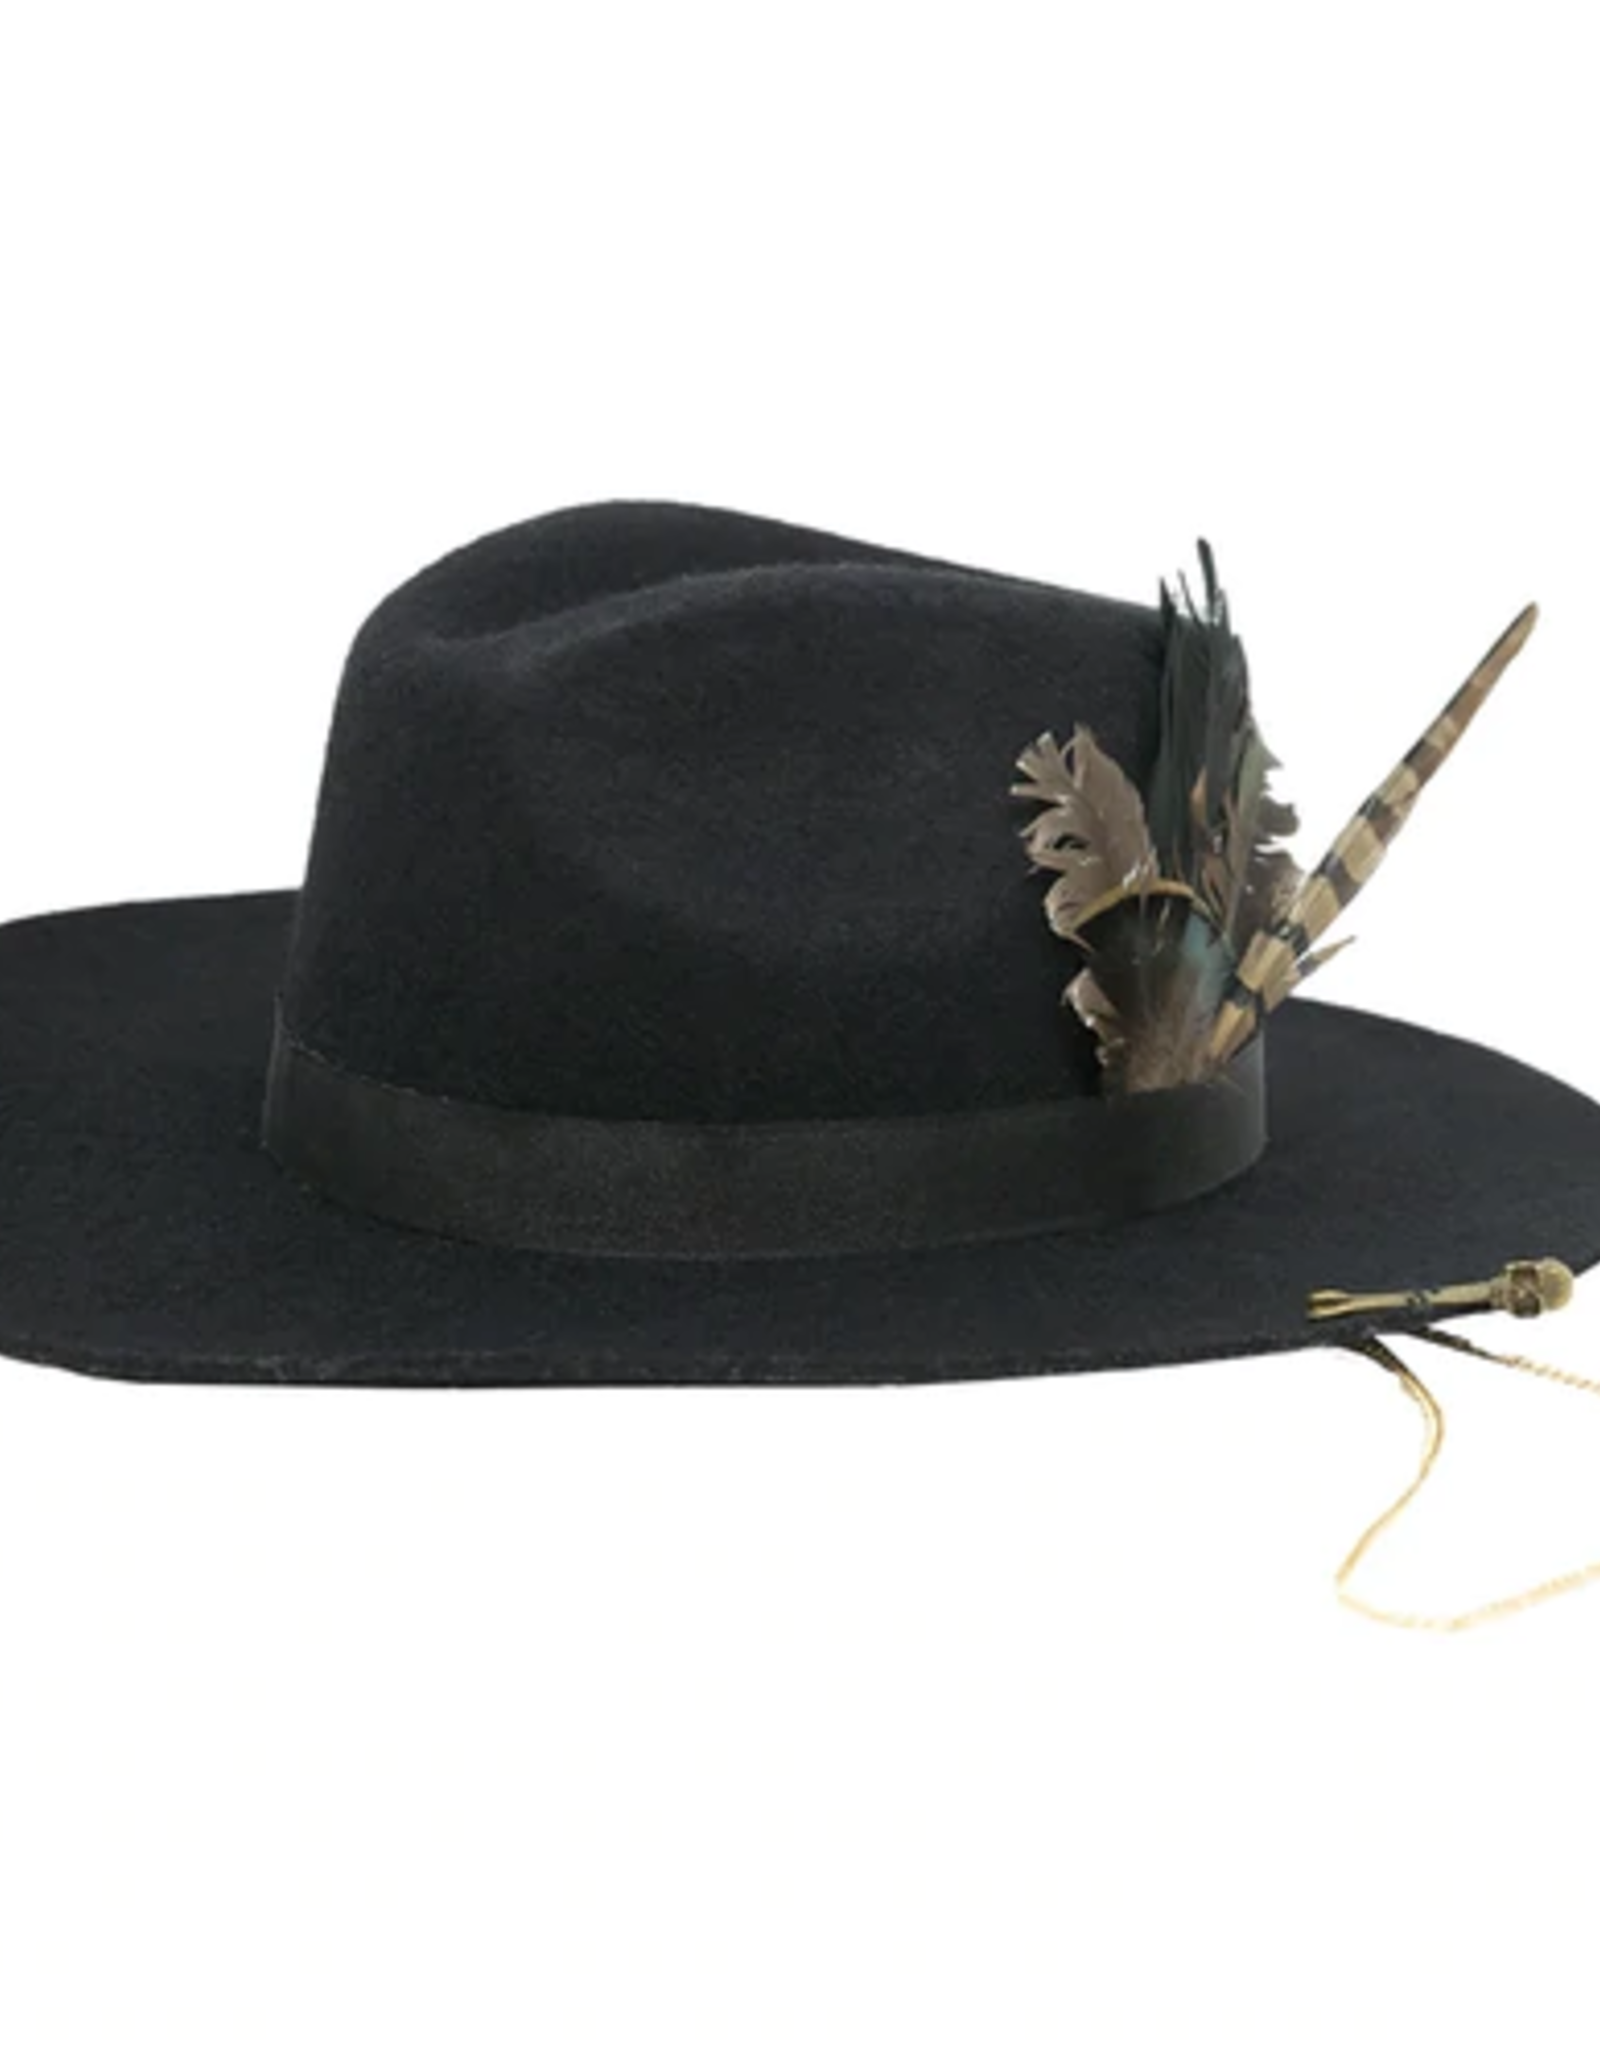 Tuluminati Edicion Limitada Hat